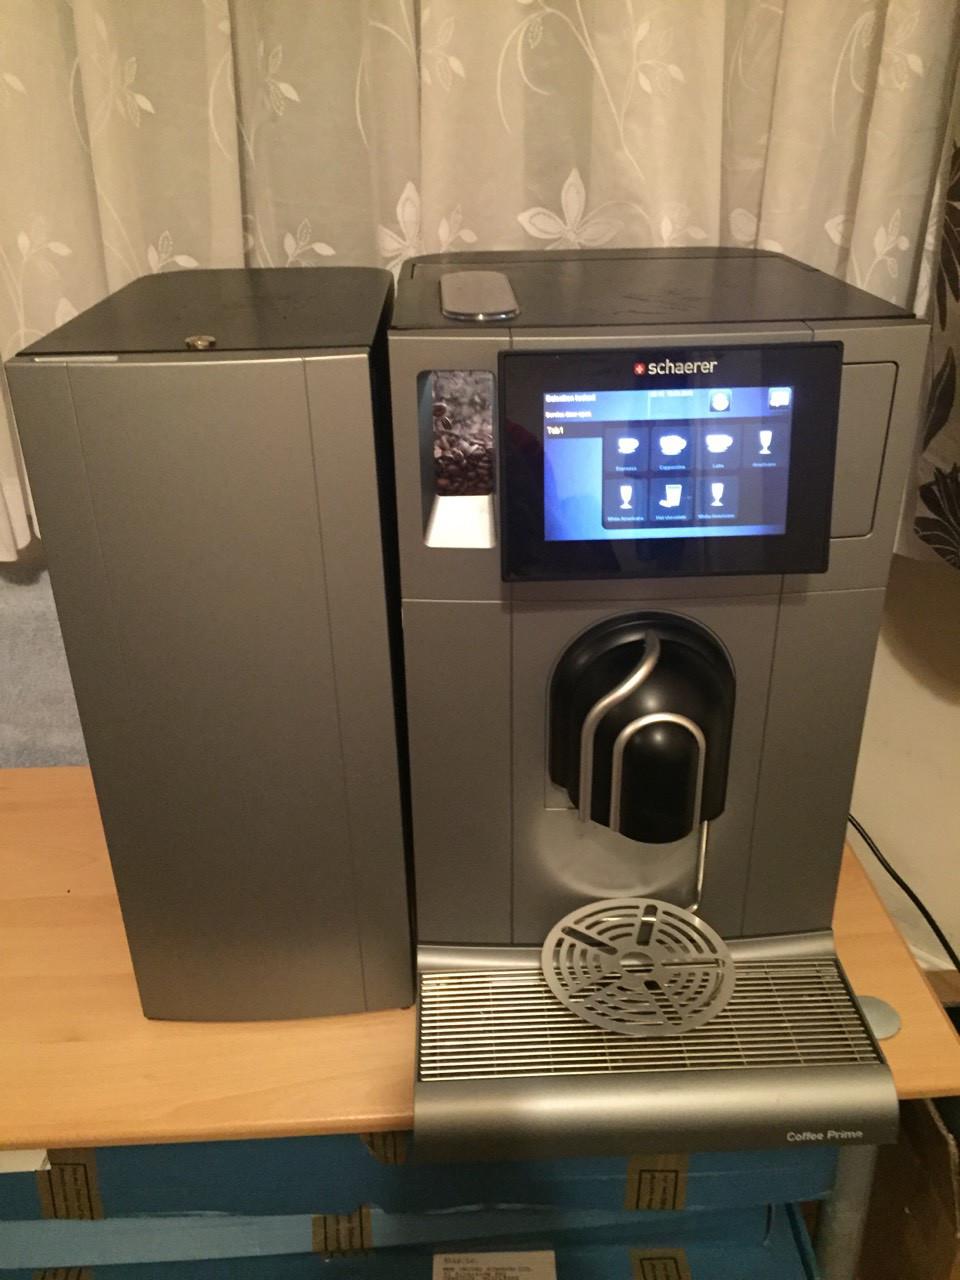 Hedendaags Schaerer coffee prime: продажа, цена в Тернополе. кофеварки LK-54